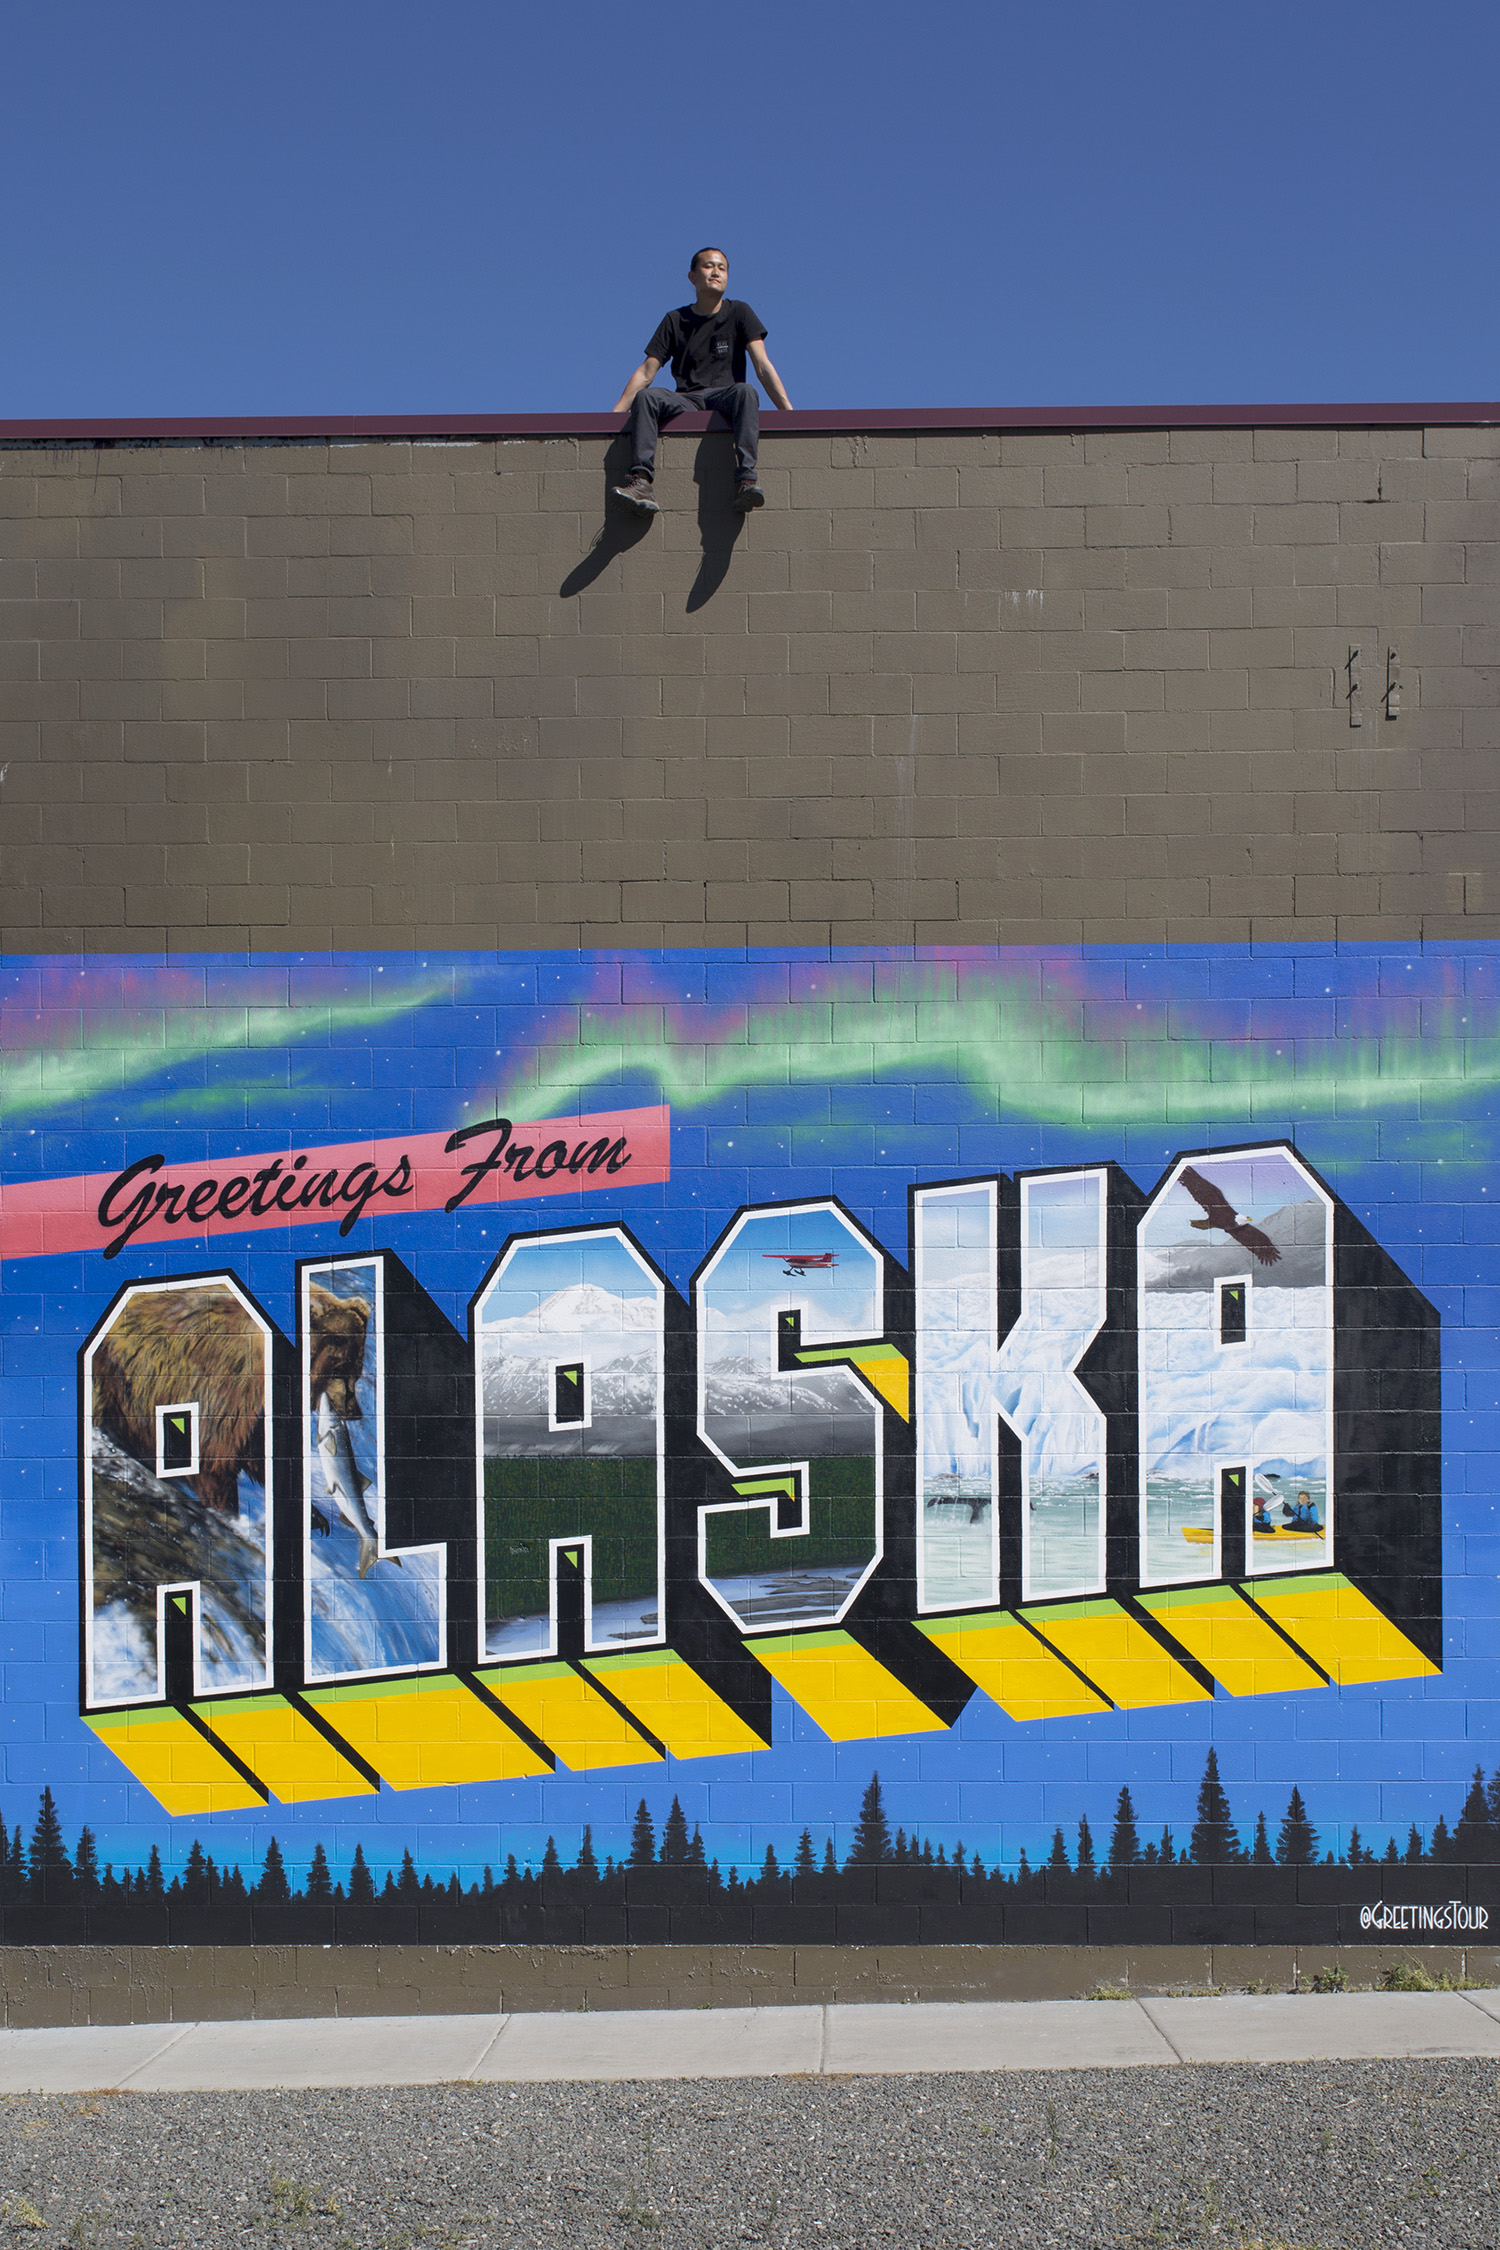 GREETINGSTOUR_ALASKA_008.jpg